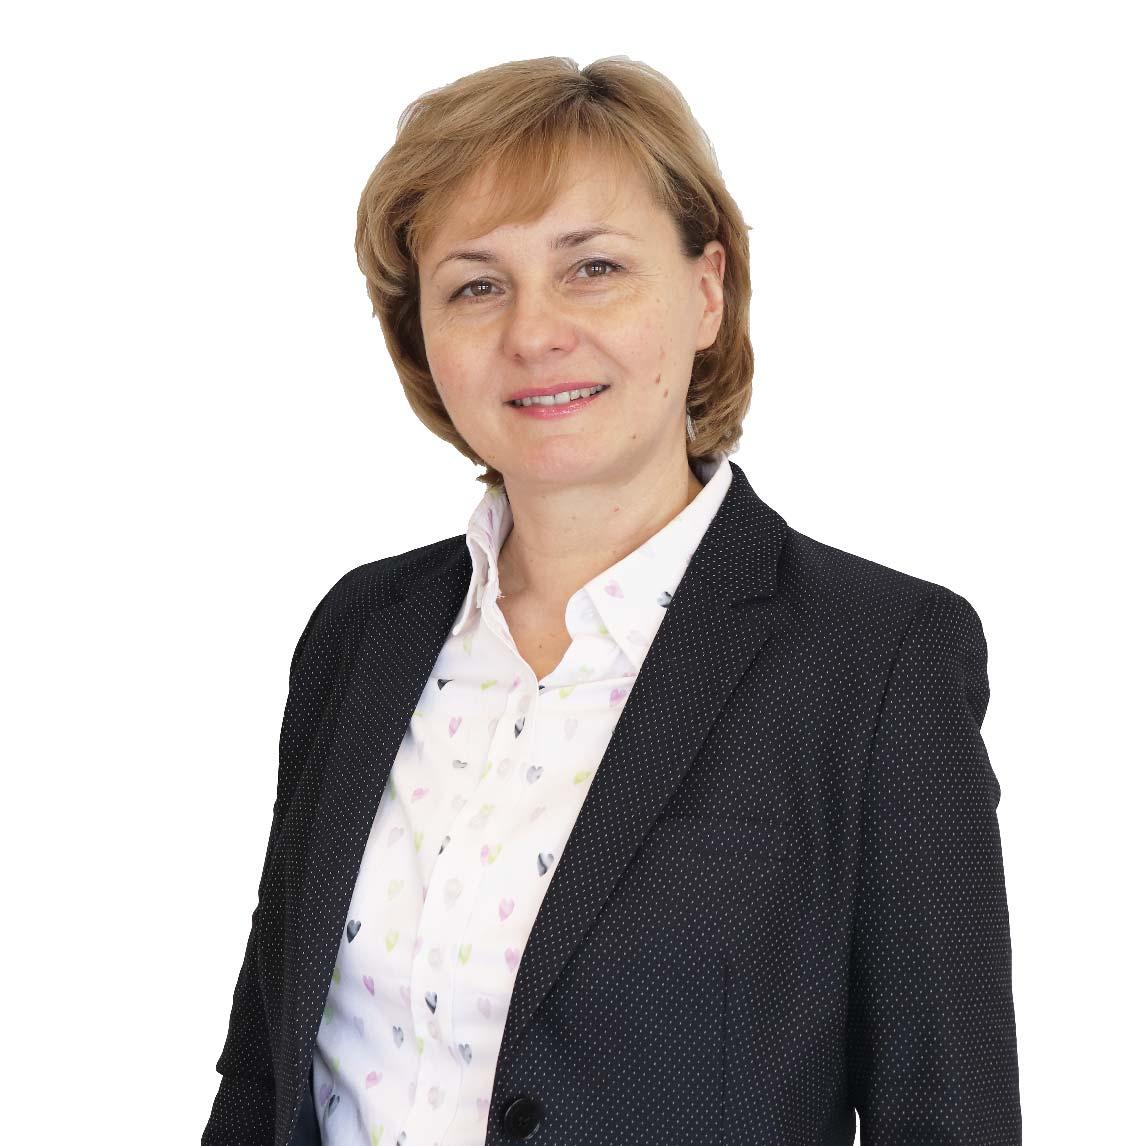 Agnieszka Podolska